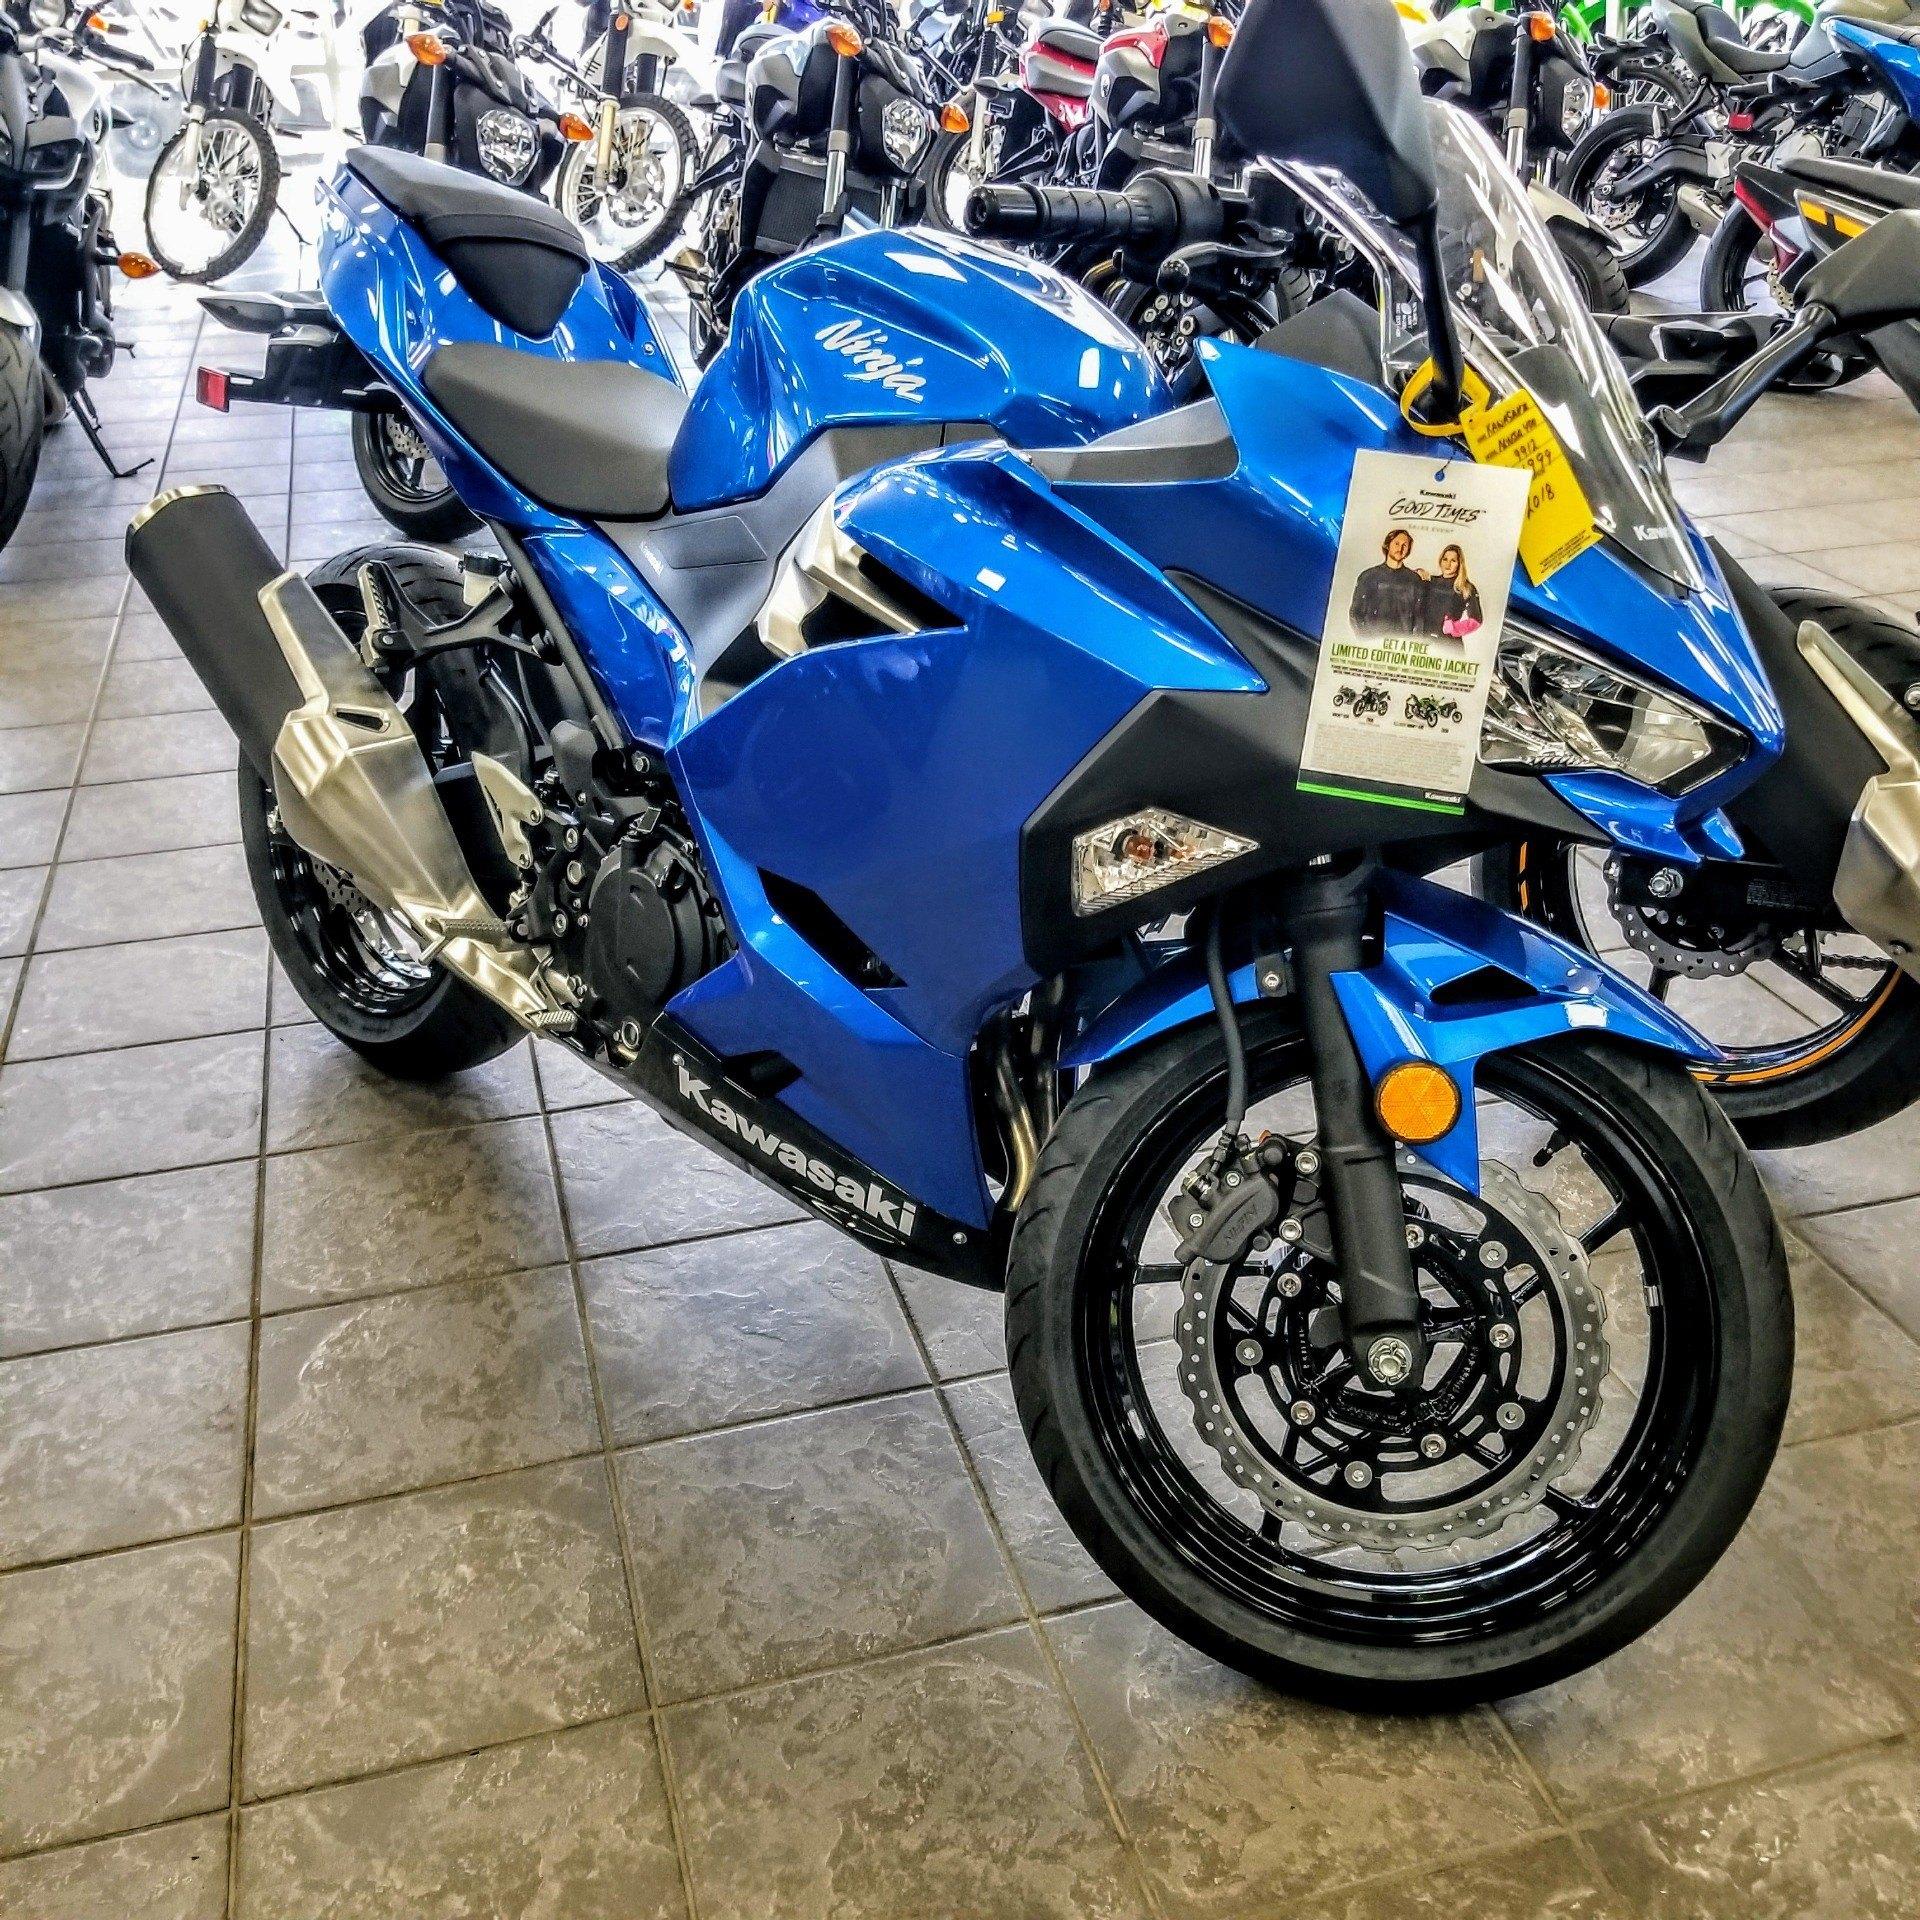 New 2018 Kawasaki Ninja 400 Motorcycles in Hickory, NC | Stock ...